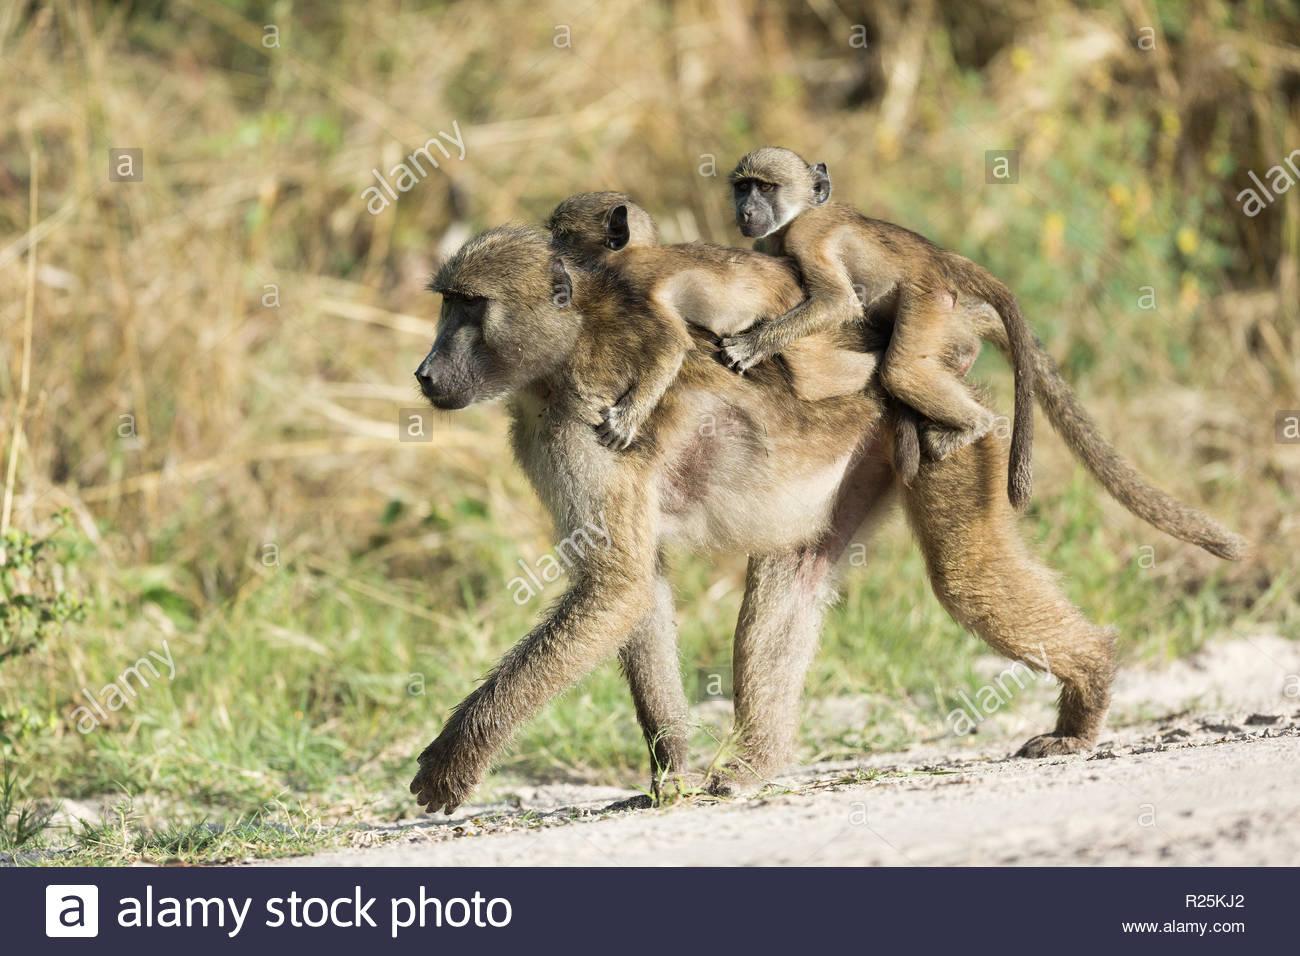 Baboon (Hamadryas papio) carrying twins, Khwai, Botswana, Africa Stock Photo